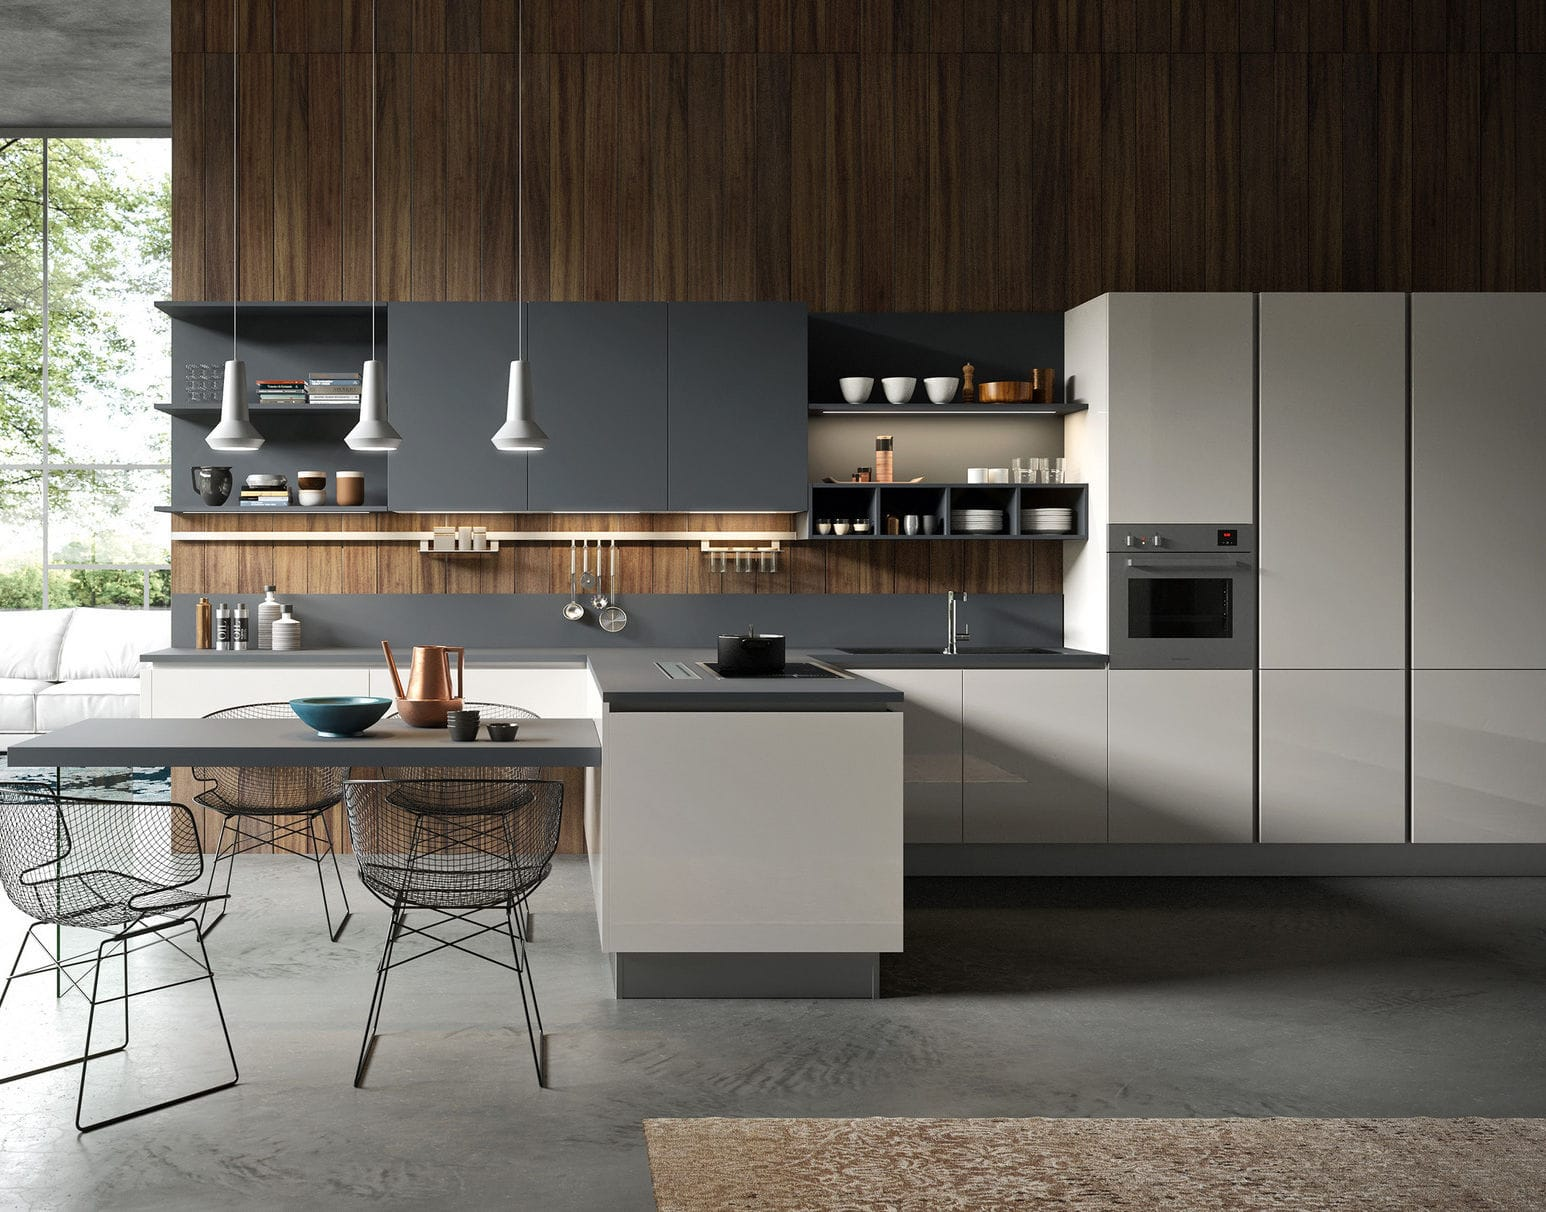 Cucina moderna / in legno laccato / opaca / senza maniglie - URBAN ...